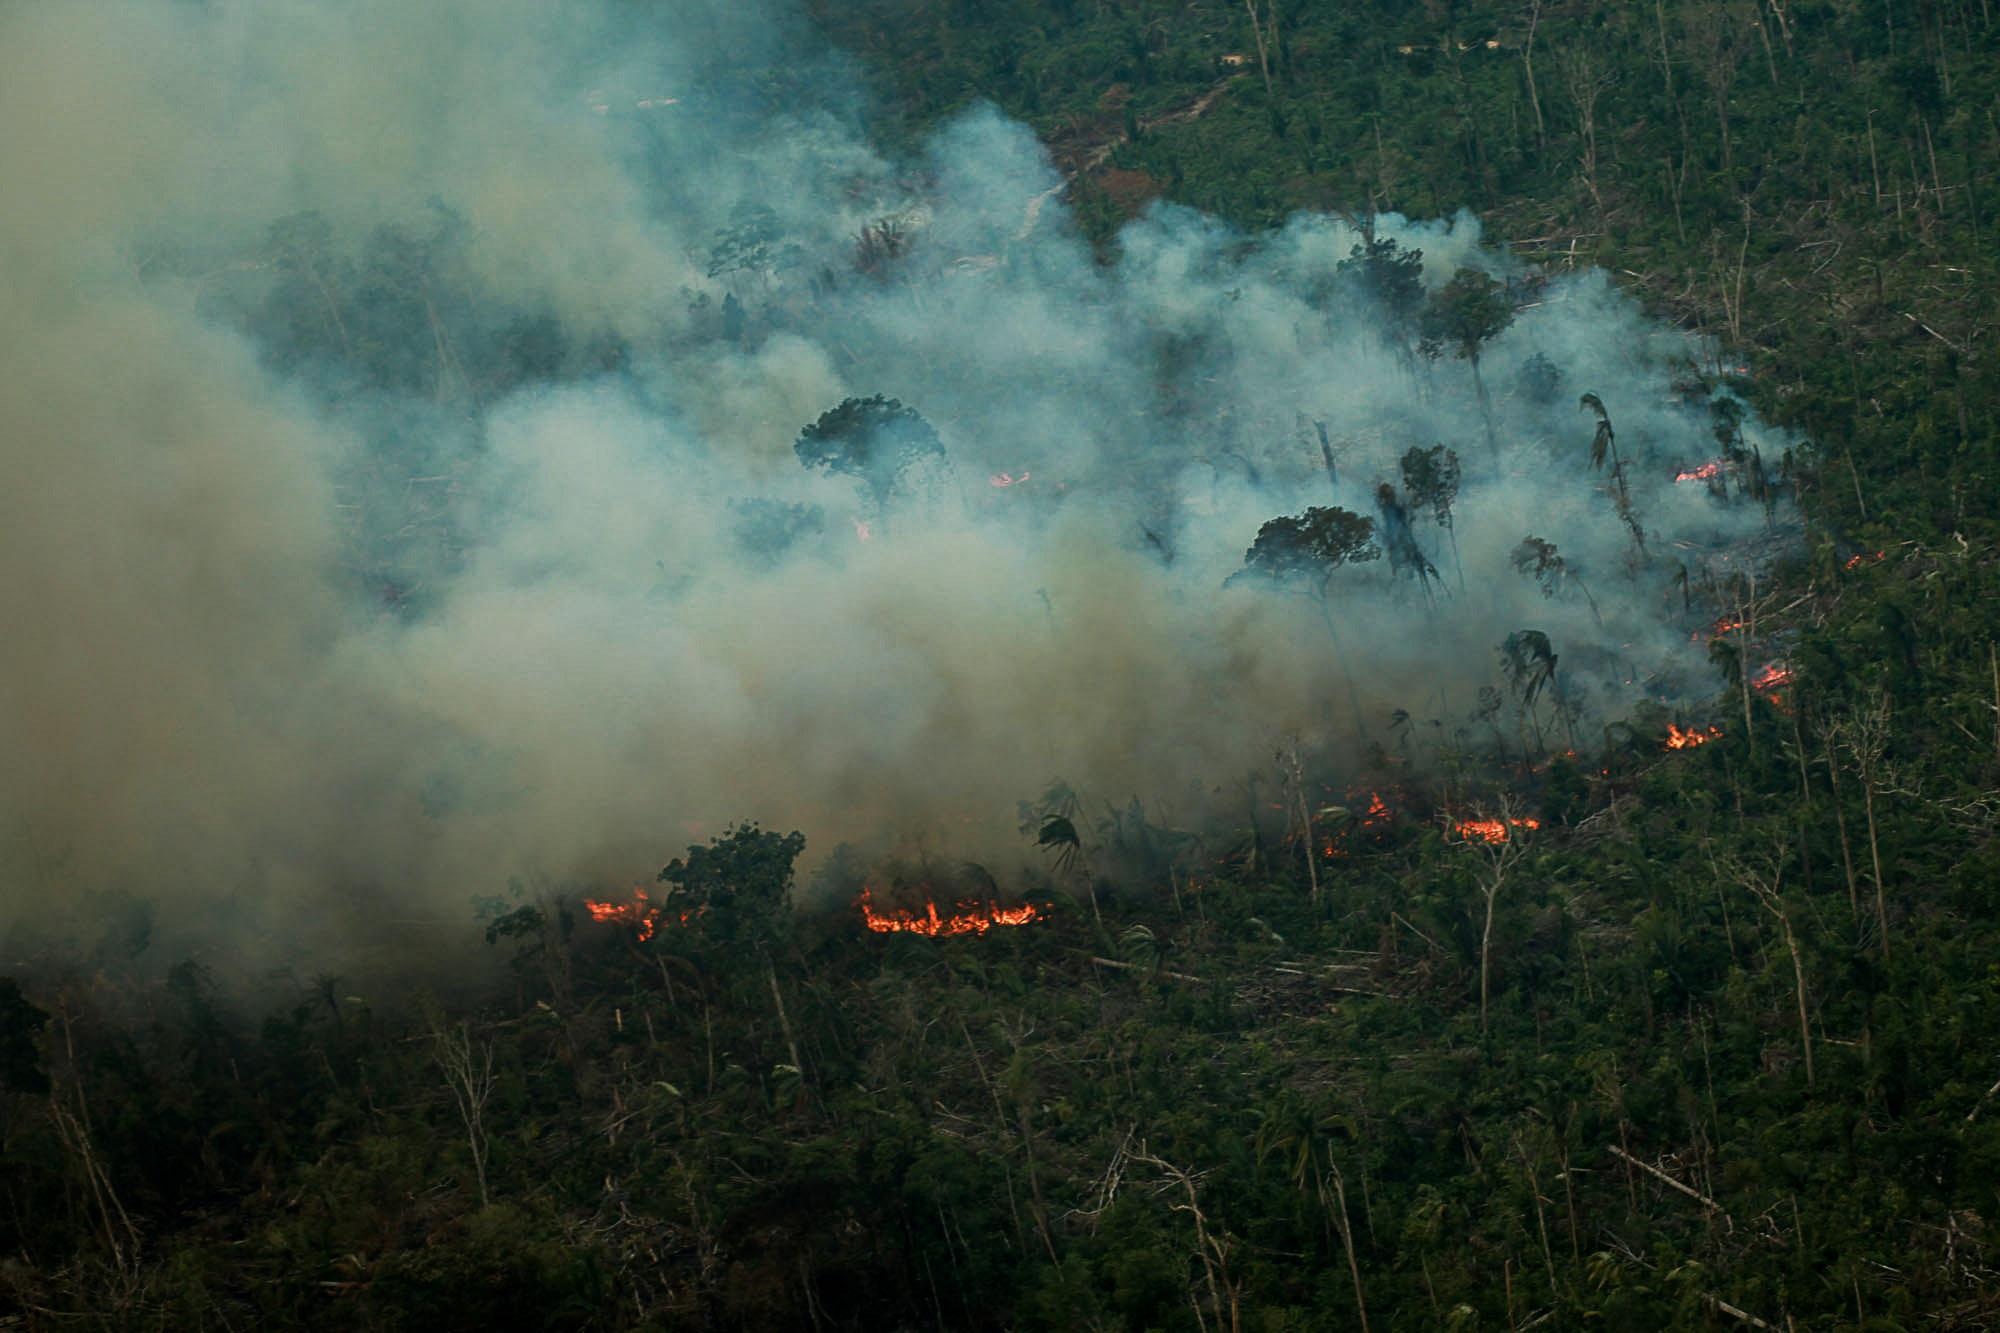 Coronavirus, desmatamento e fogo na Amazônia